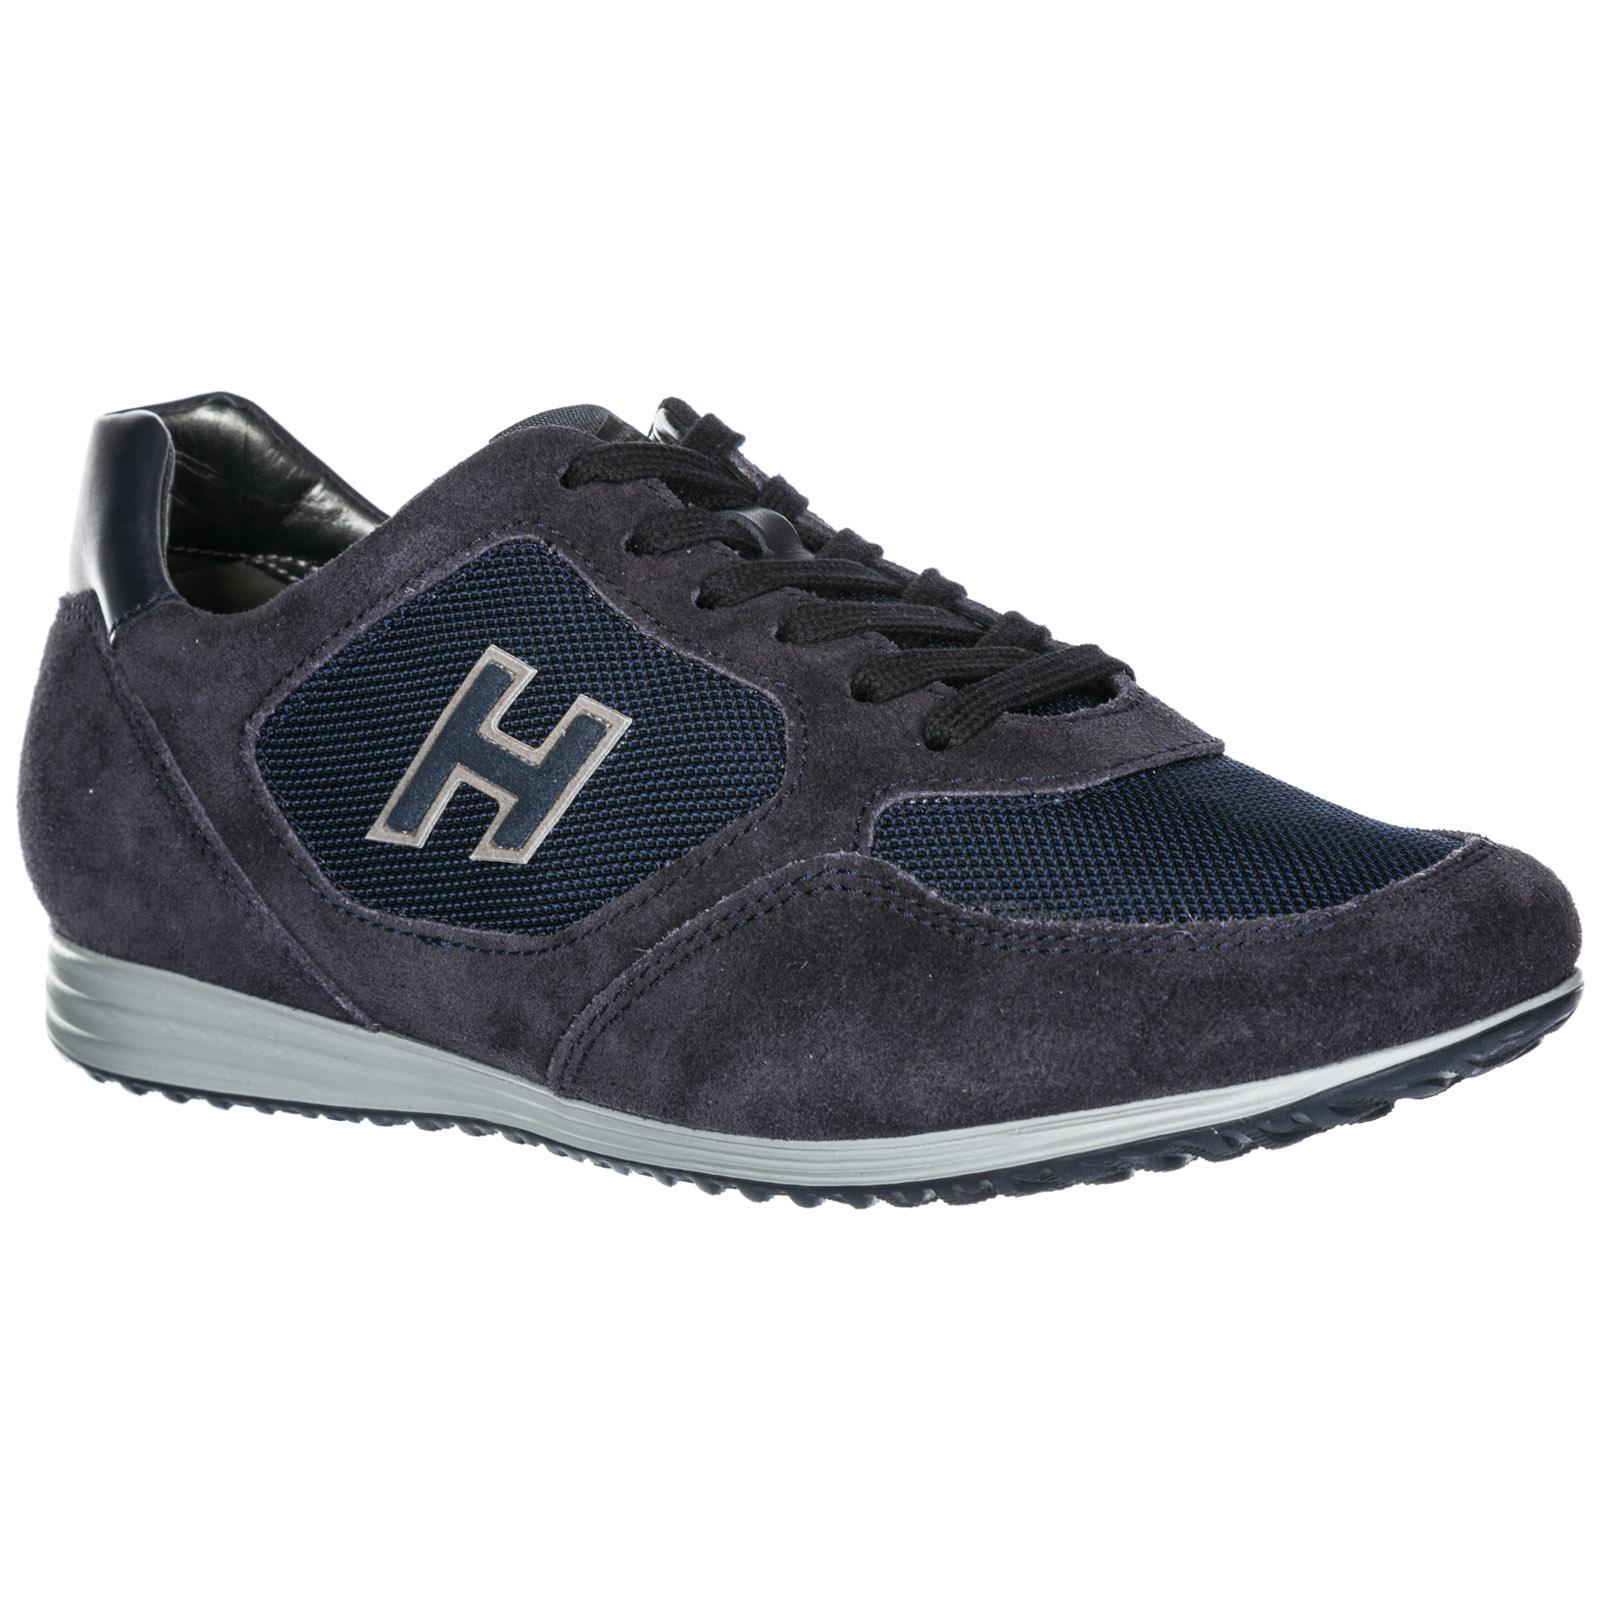 Sneakers Hogan Olympia X - H205 HXM2050Q1508CW2264 blu notte ... 9c9236663d5